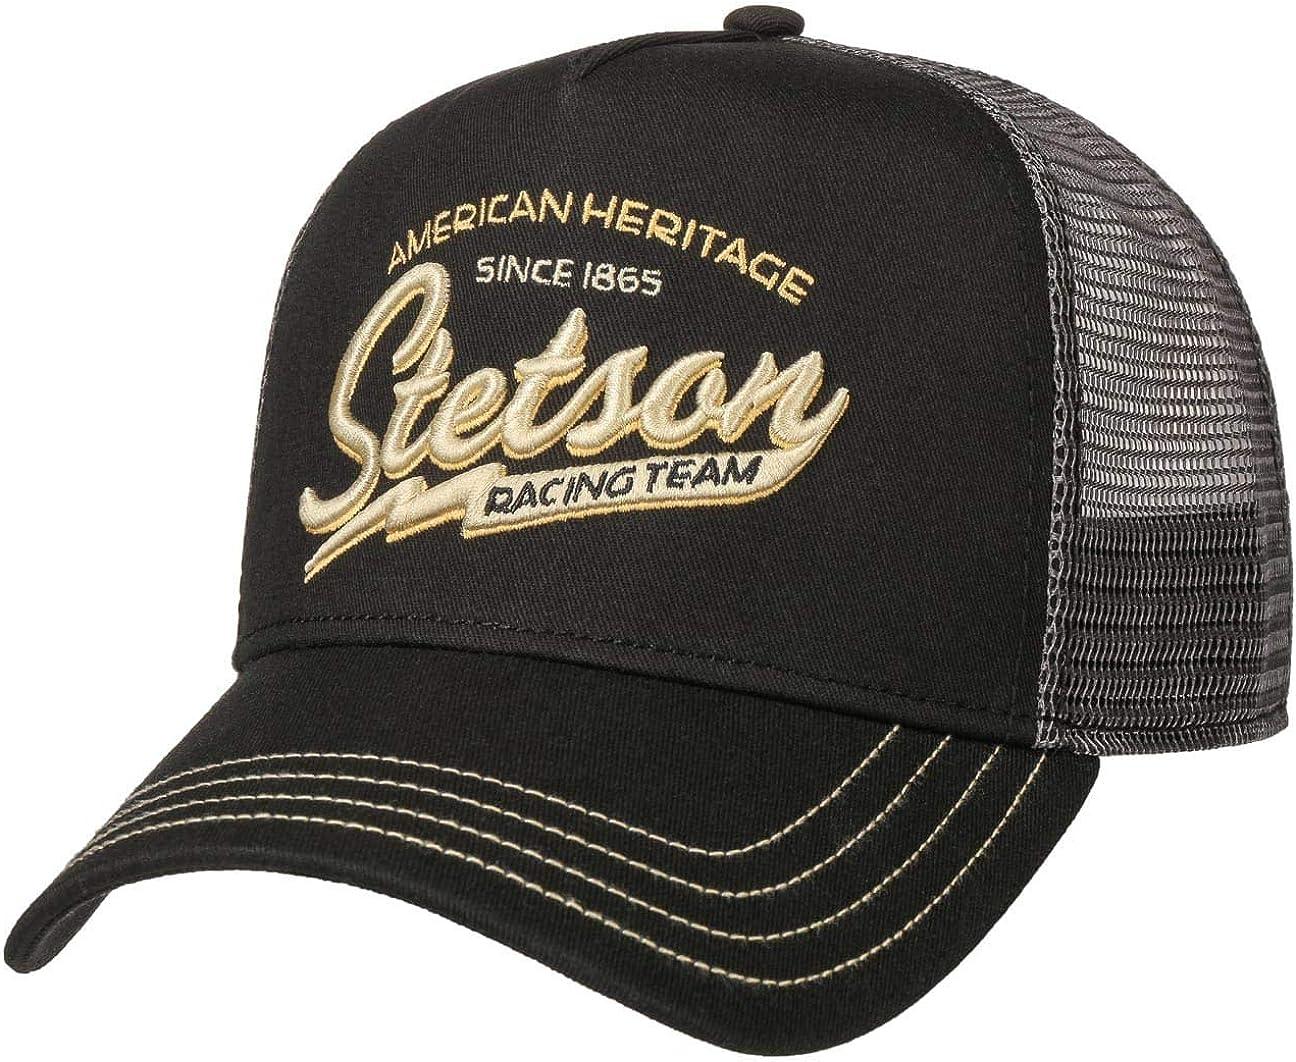 Stetson Gorra Trucker Racing Team Hombre - de Baseball Malla Beisbol Snapback, con Visera, Visera Verano/Invierno